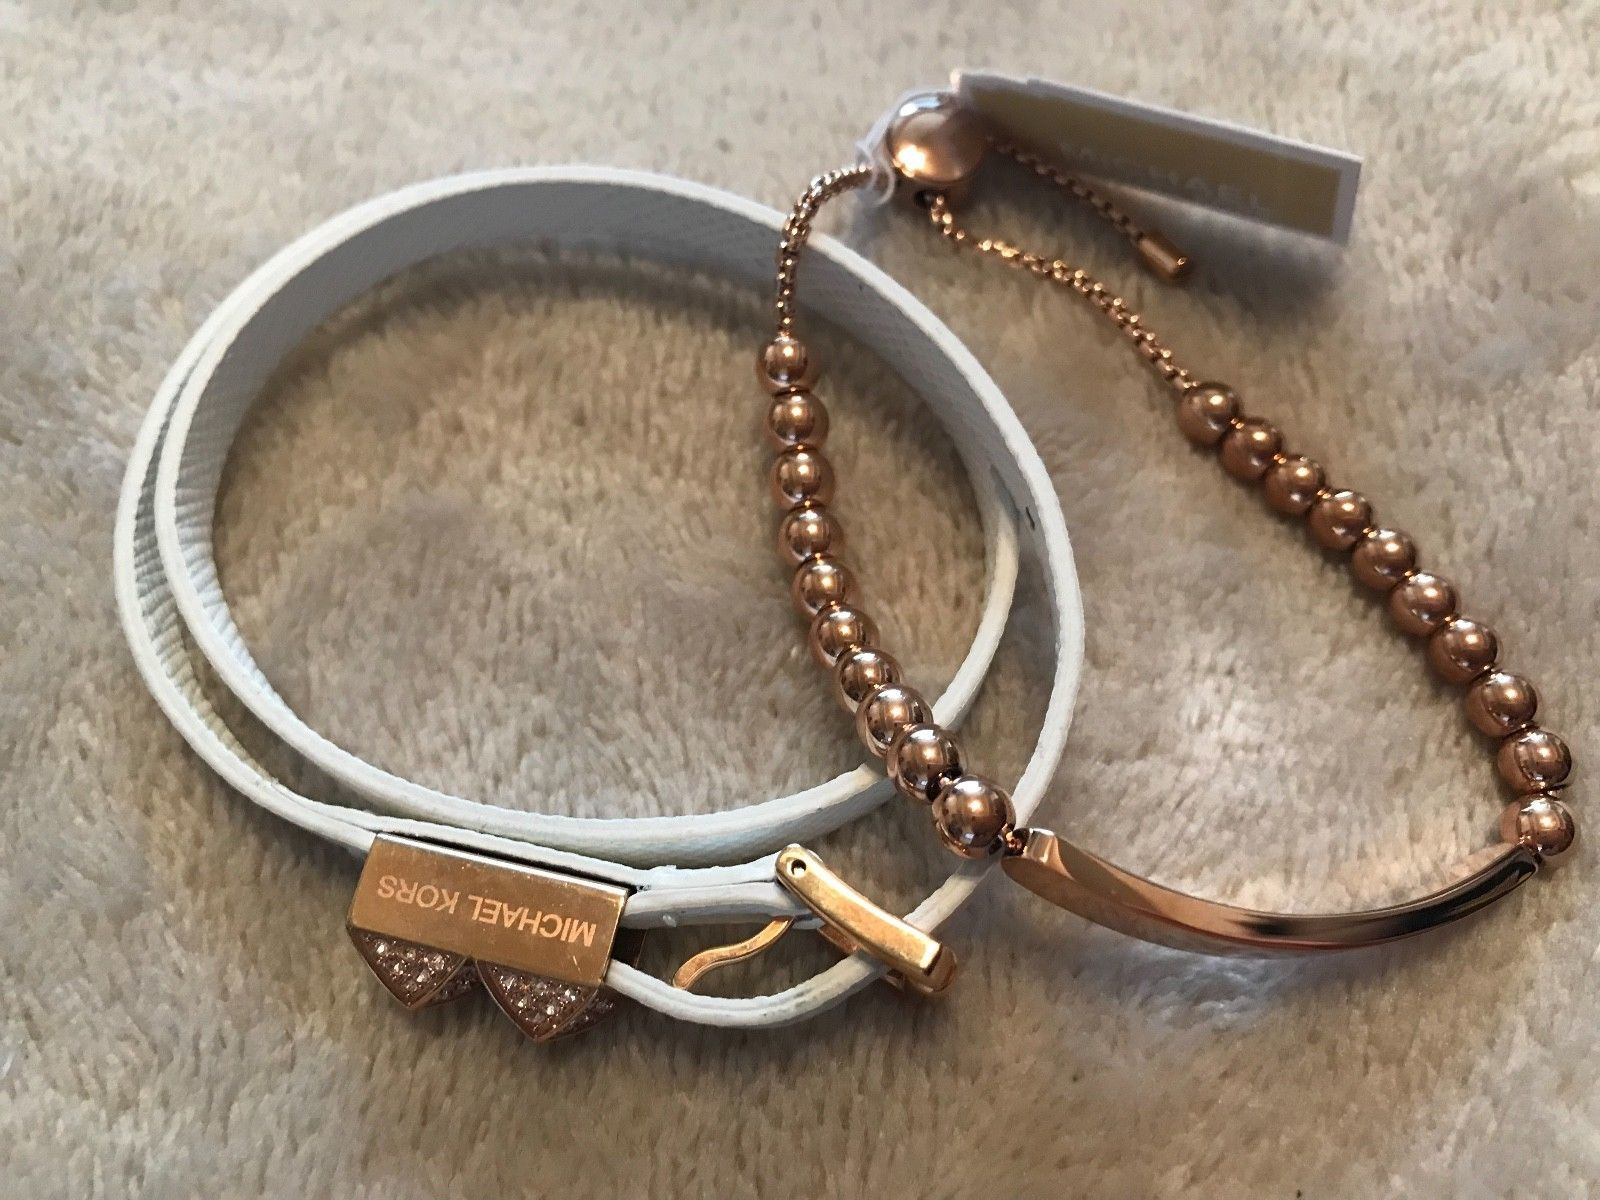 78e44c45ae00 ... Michael Kors Rose Gold Pave and 50 similar items. S l1600